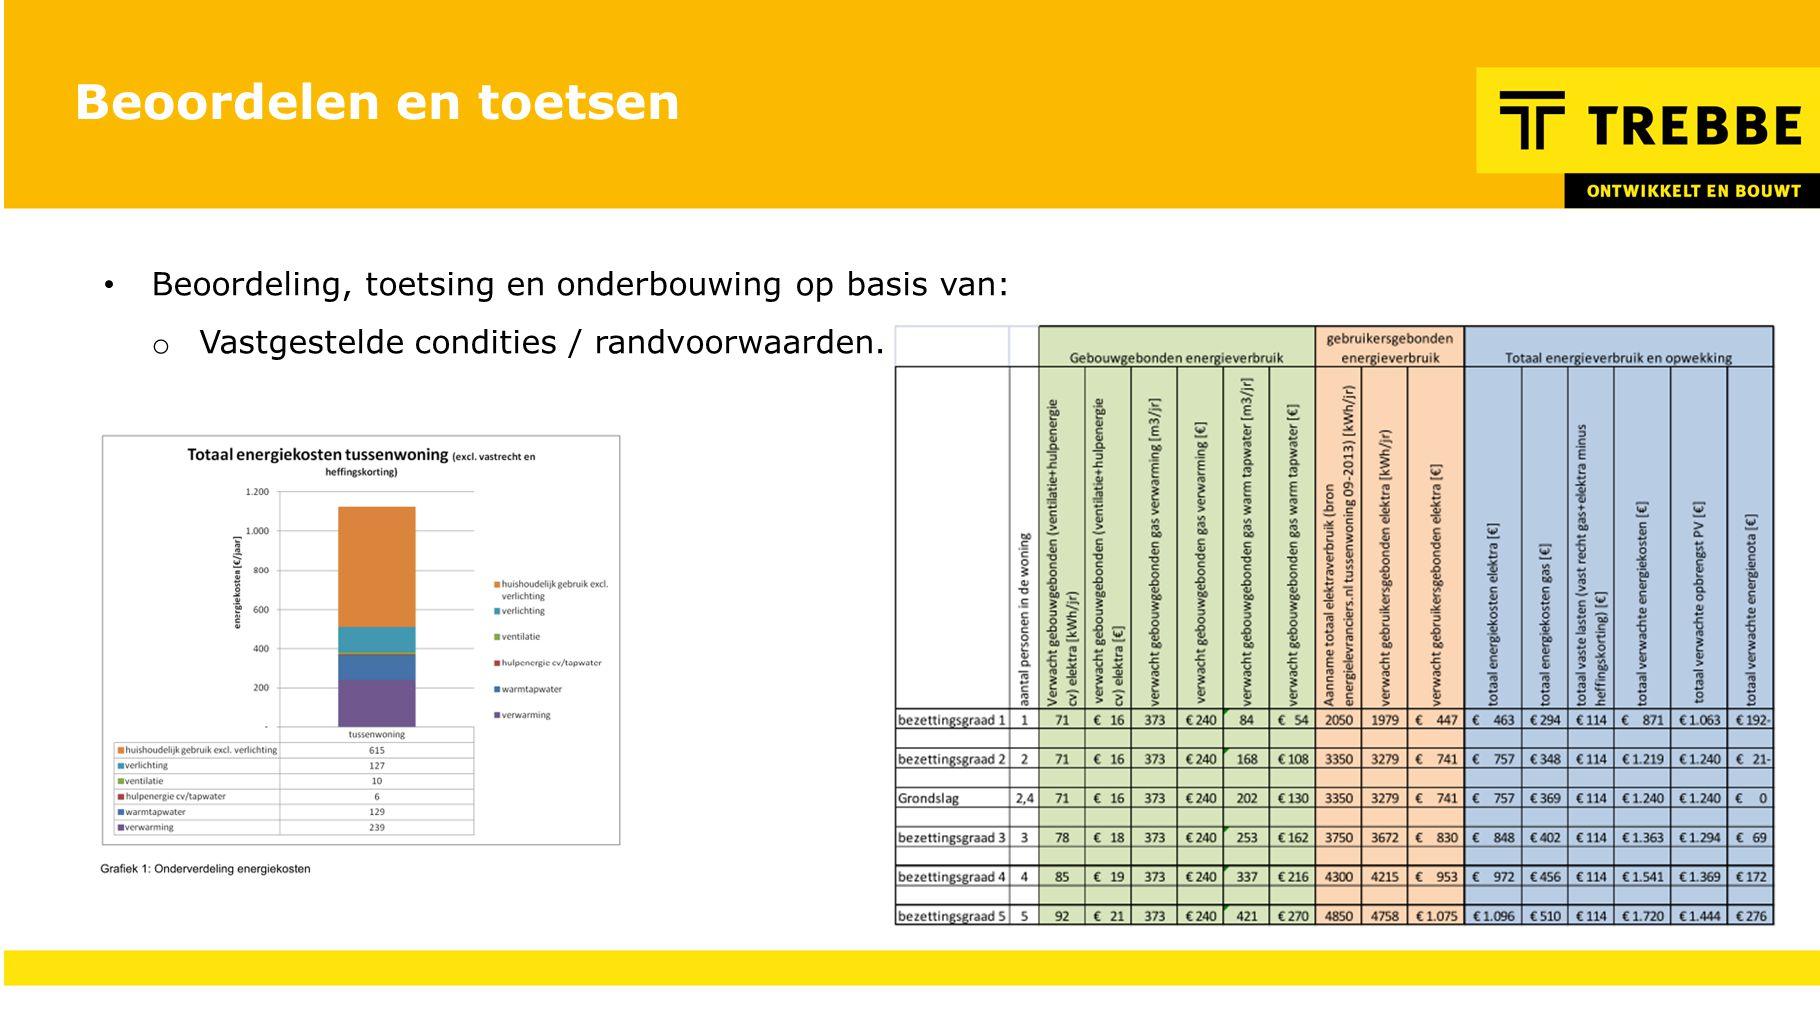 Beoordelen en toetsen Beoordeling, toetsing en onderbouwing op basis van: Vastgestelde condities / randvoorwaarden.